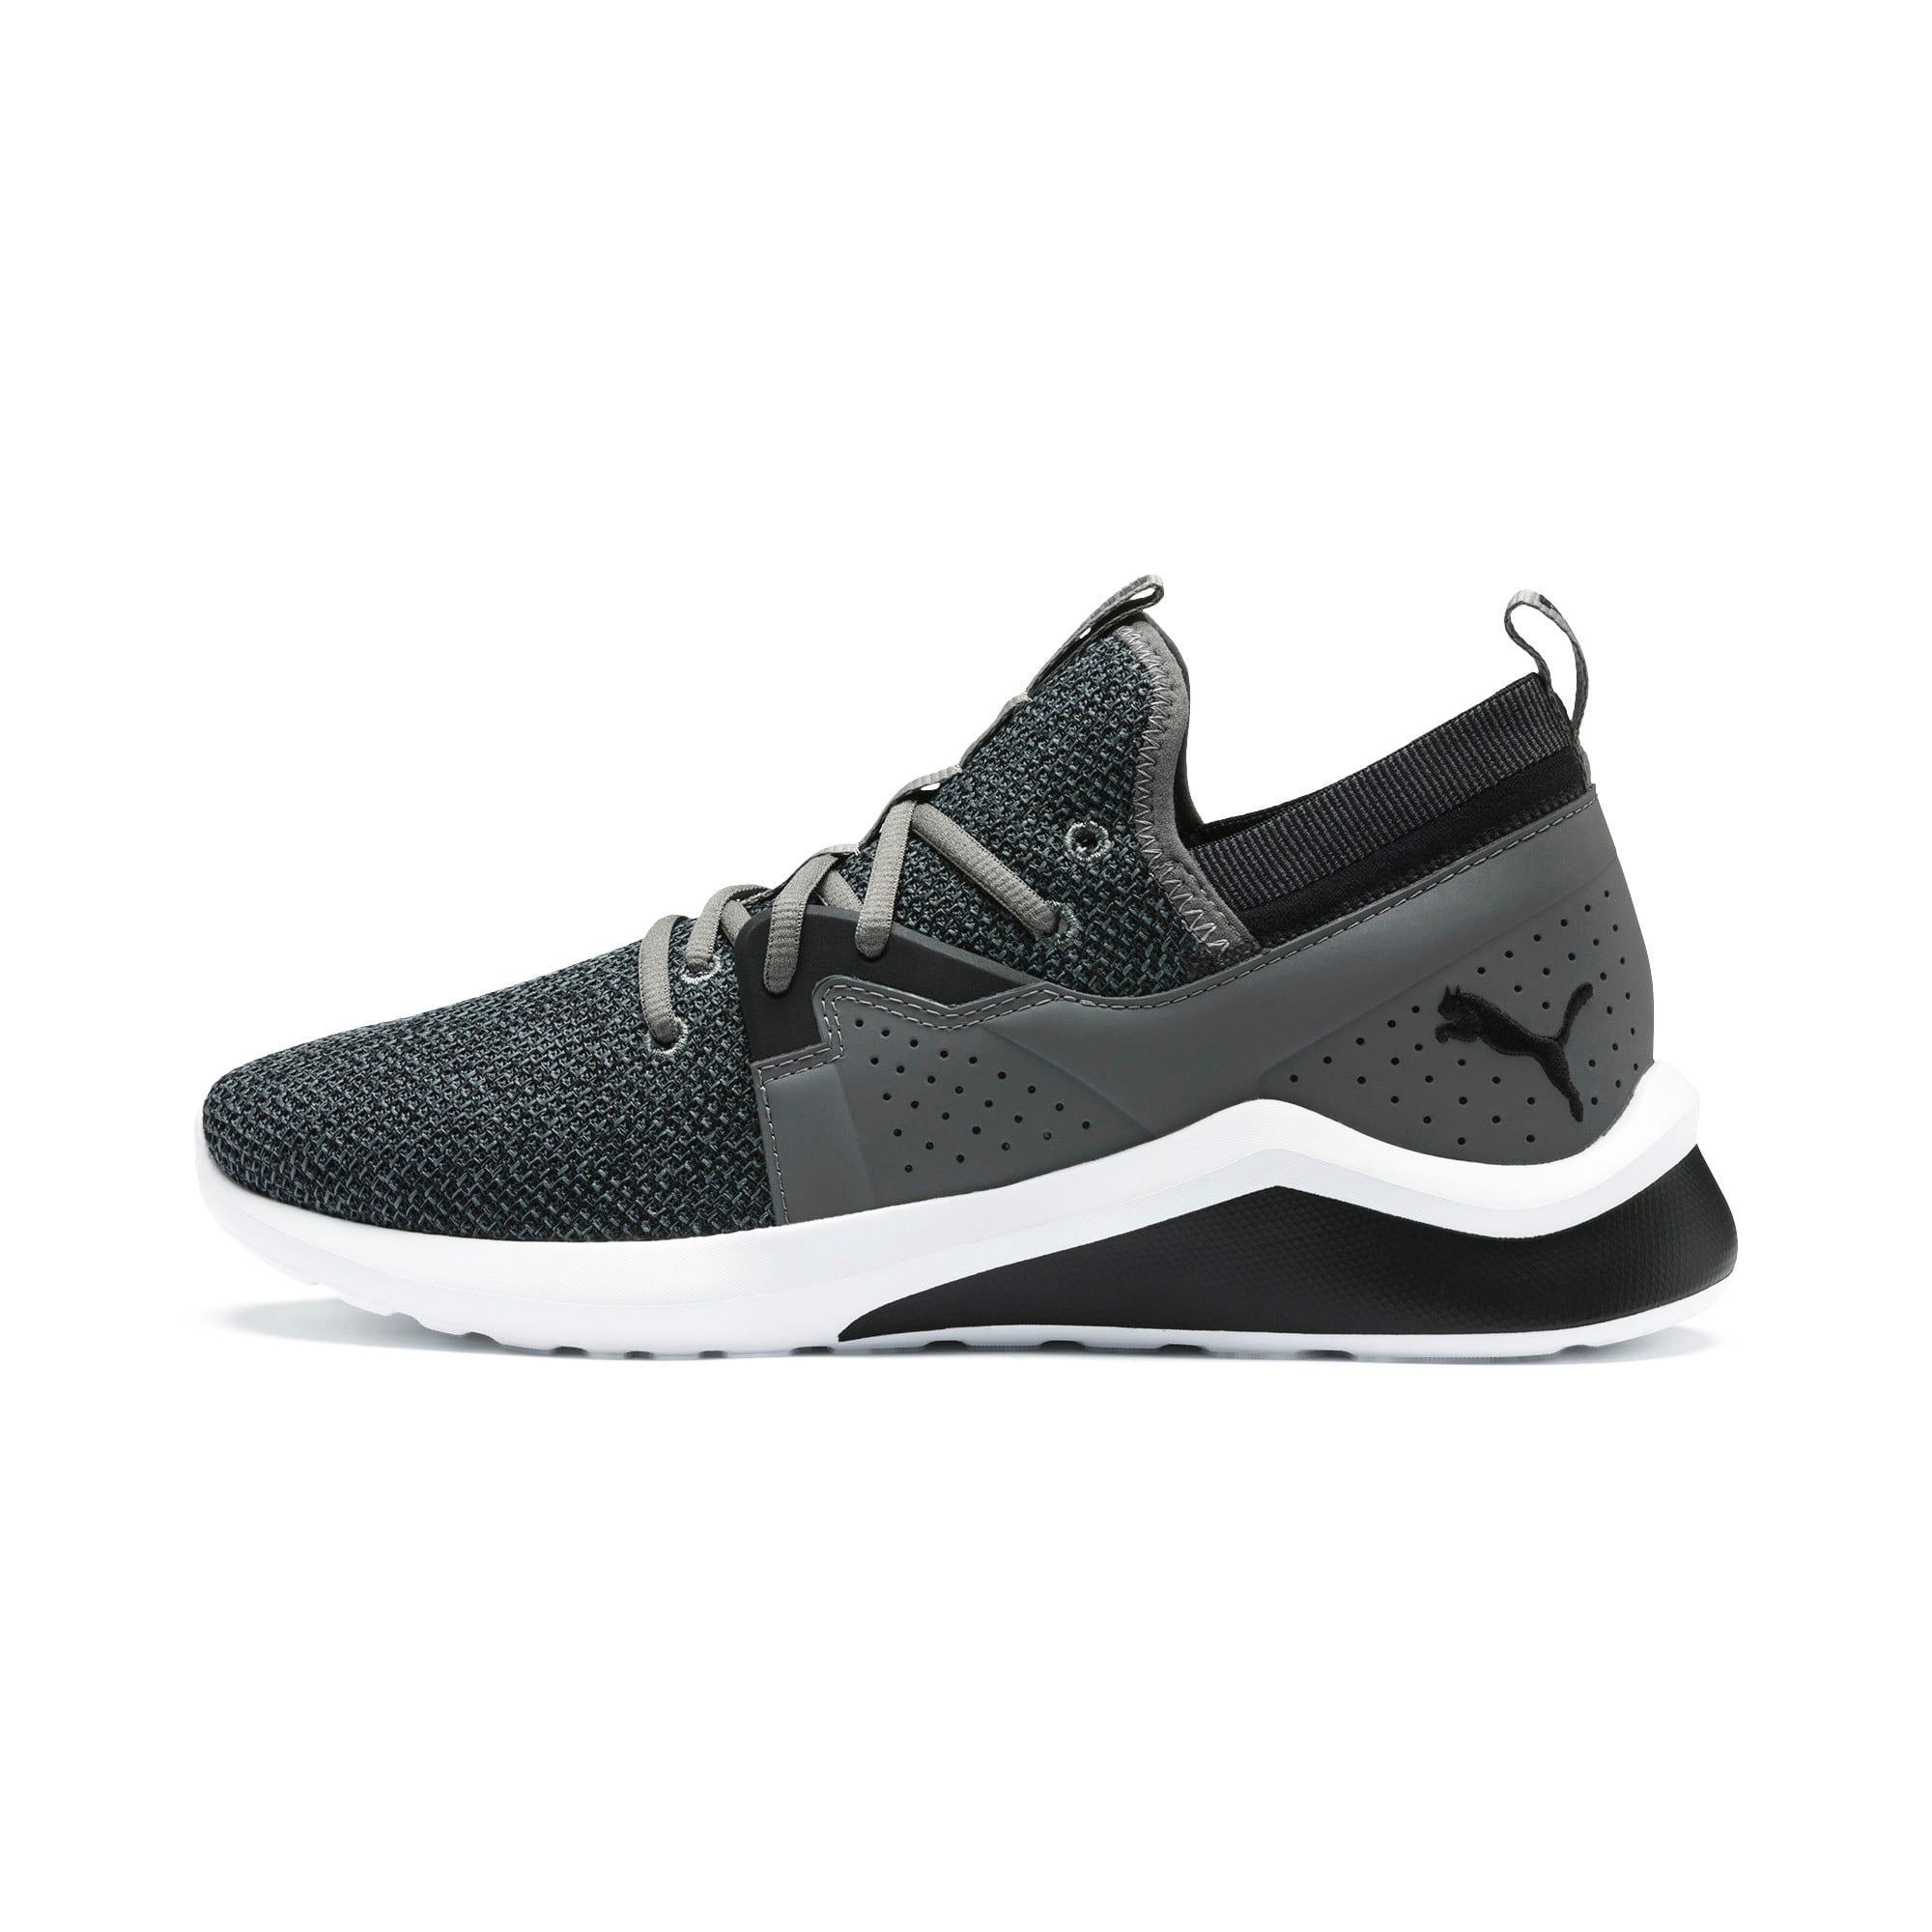 Miniatura 1 de Zapatos deportivos Emergence para hombre, CASTLEROCK-Puma Black, mediano